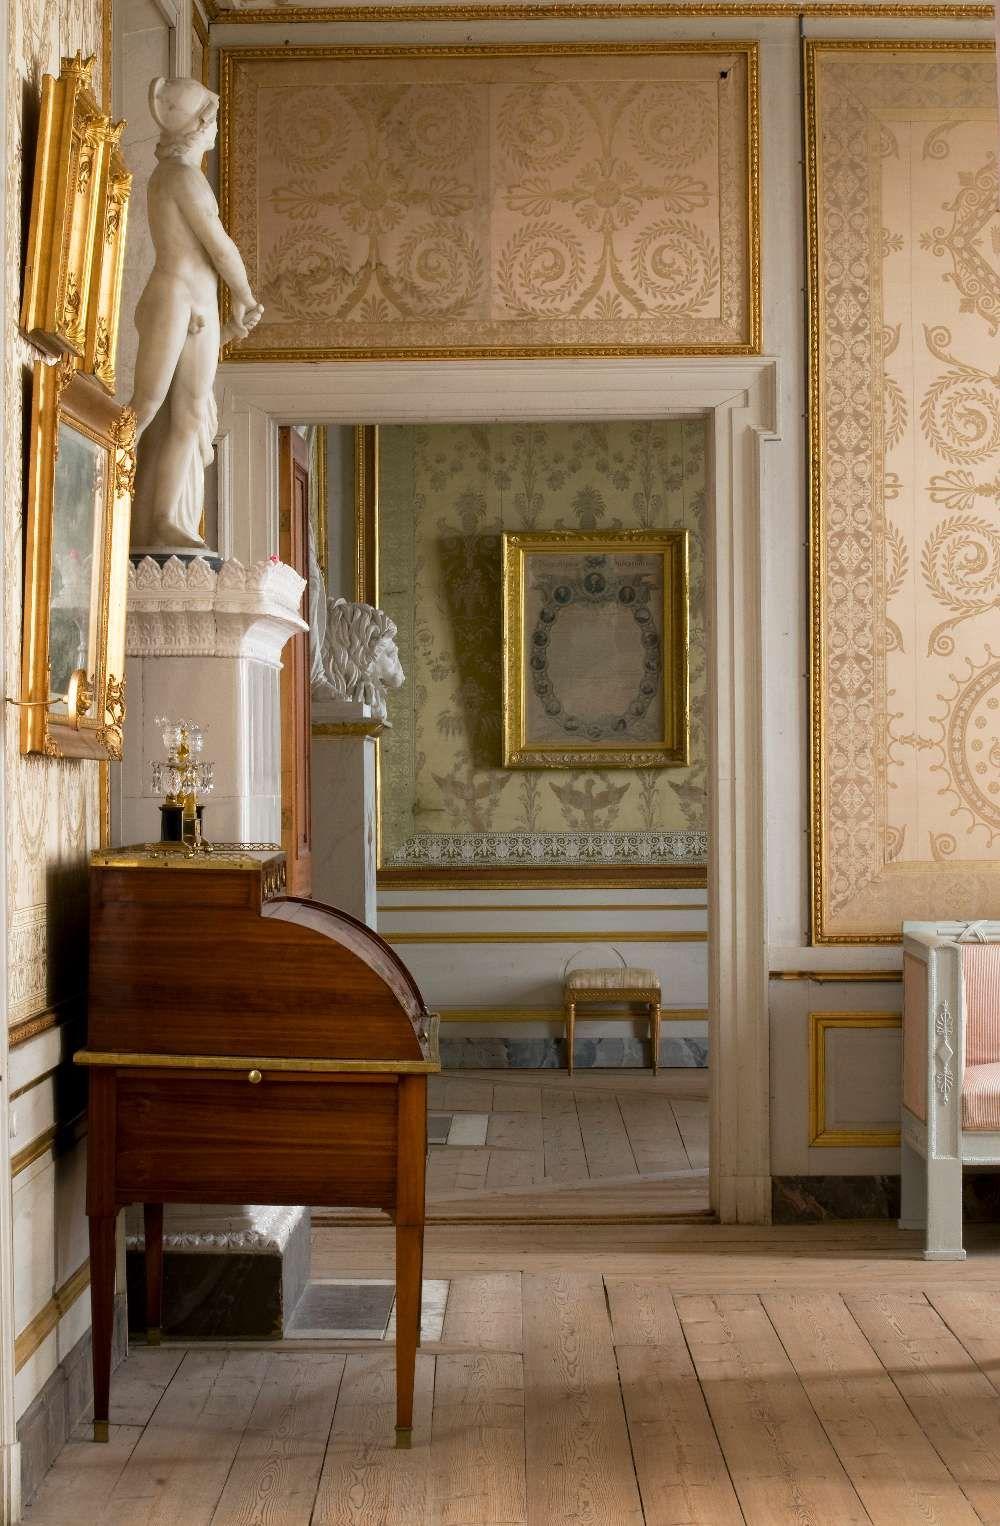 swedish/gustavian | swedish/gustavian interiors | pinterest